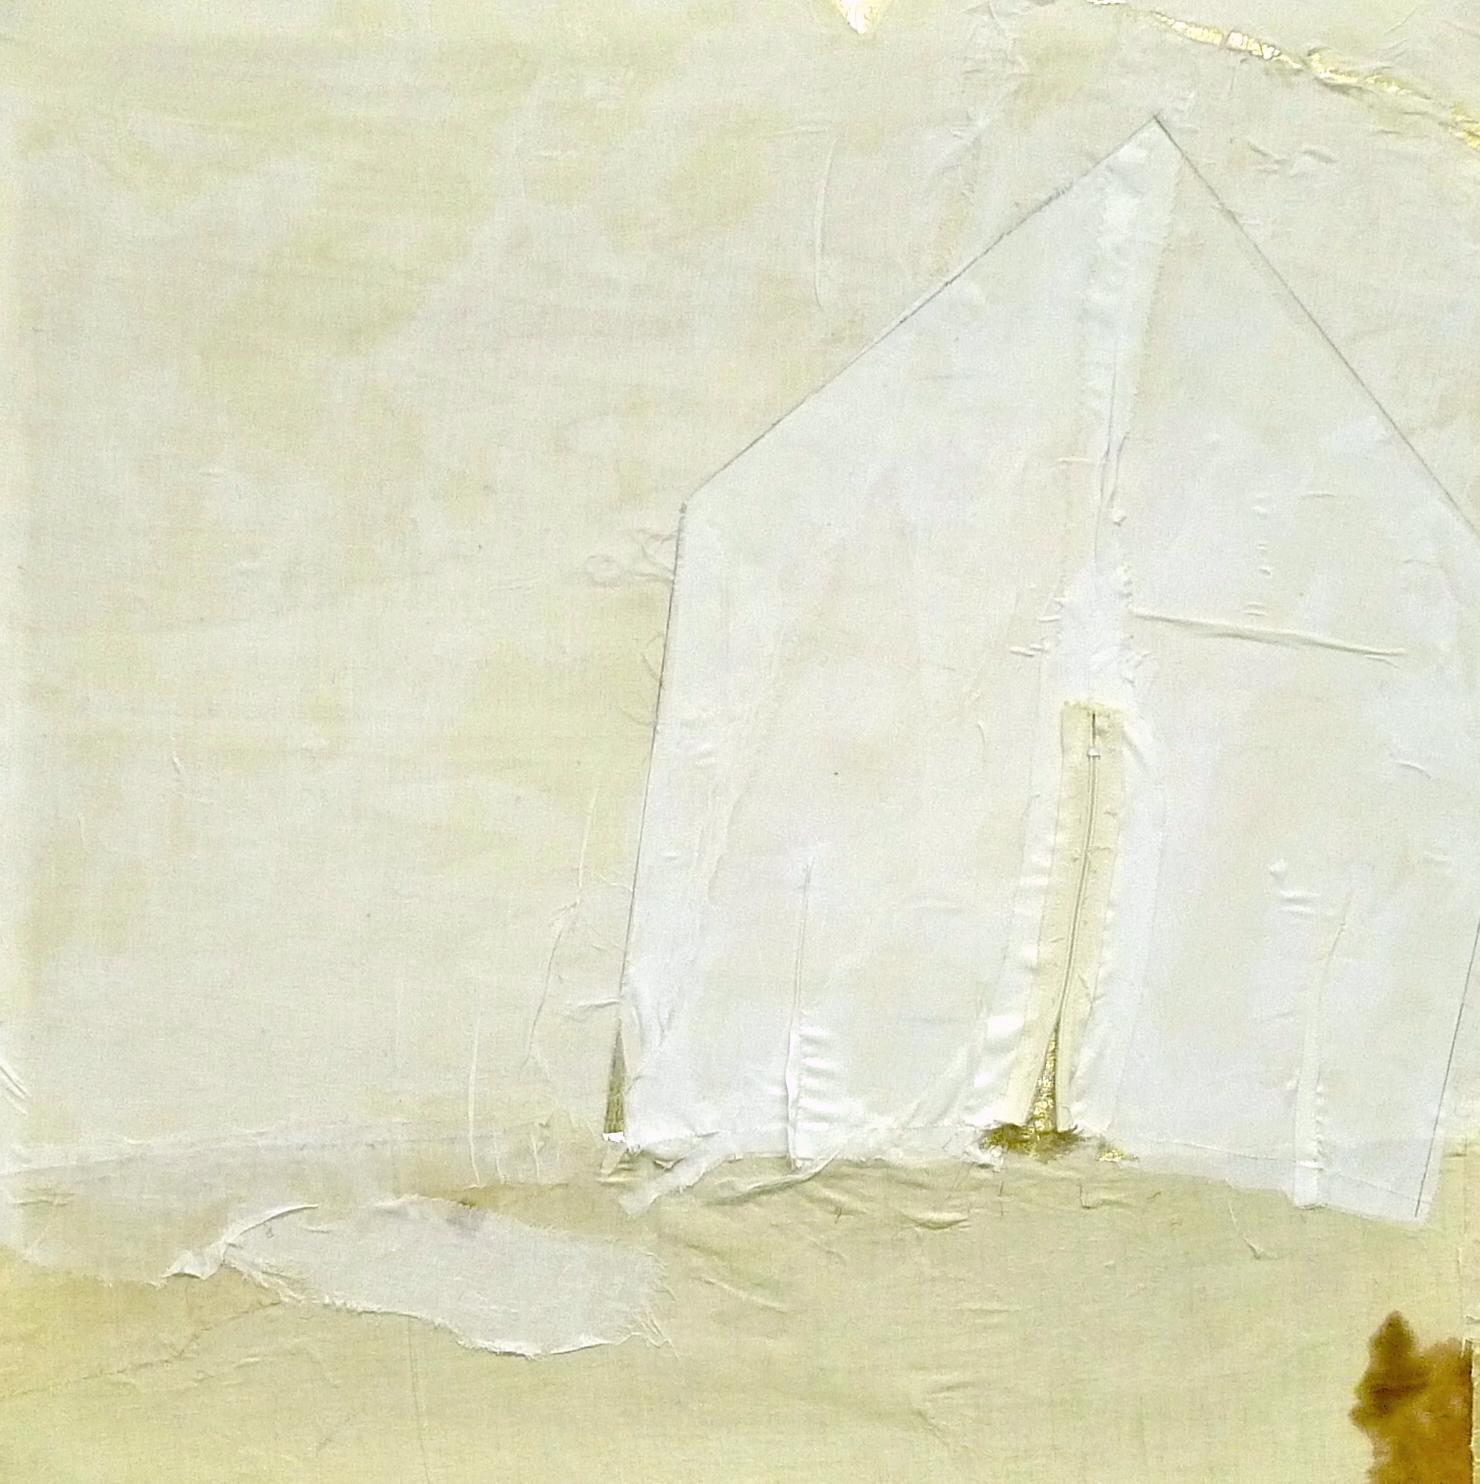 """Kintsugi III"" (detail) by Brenda Cirioni"